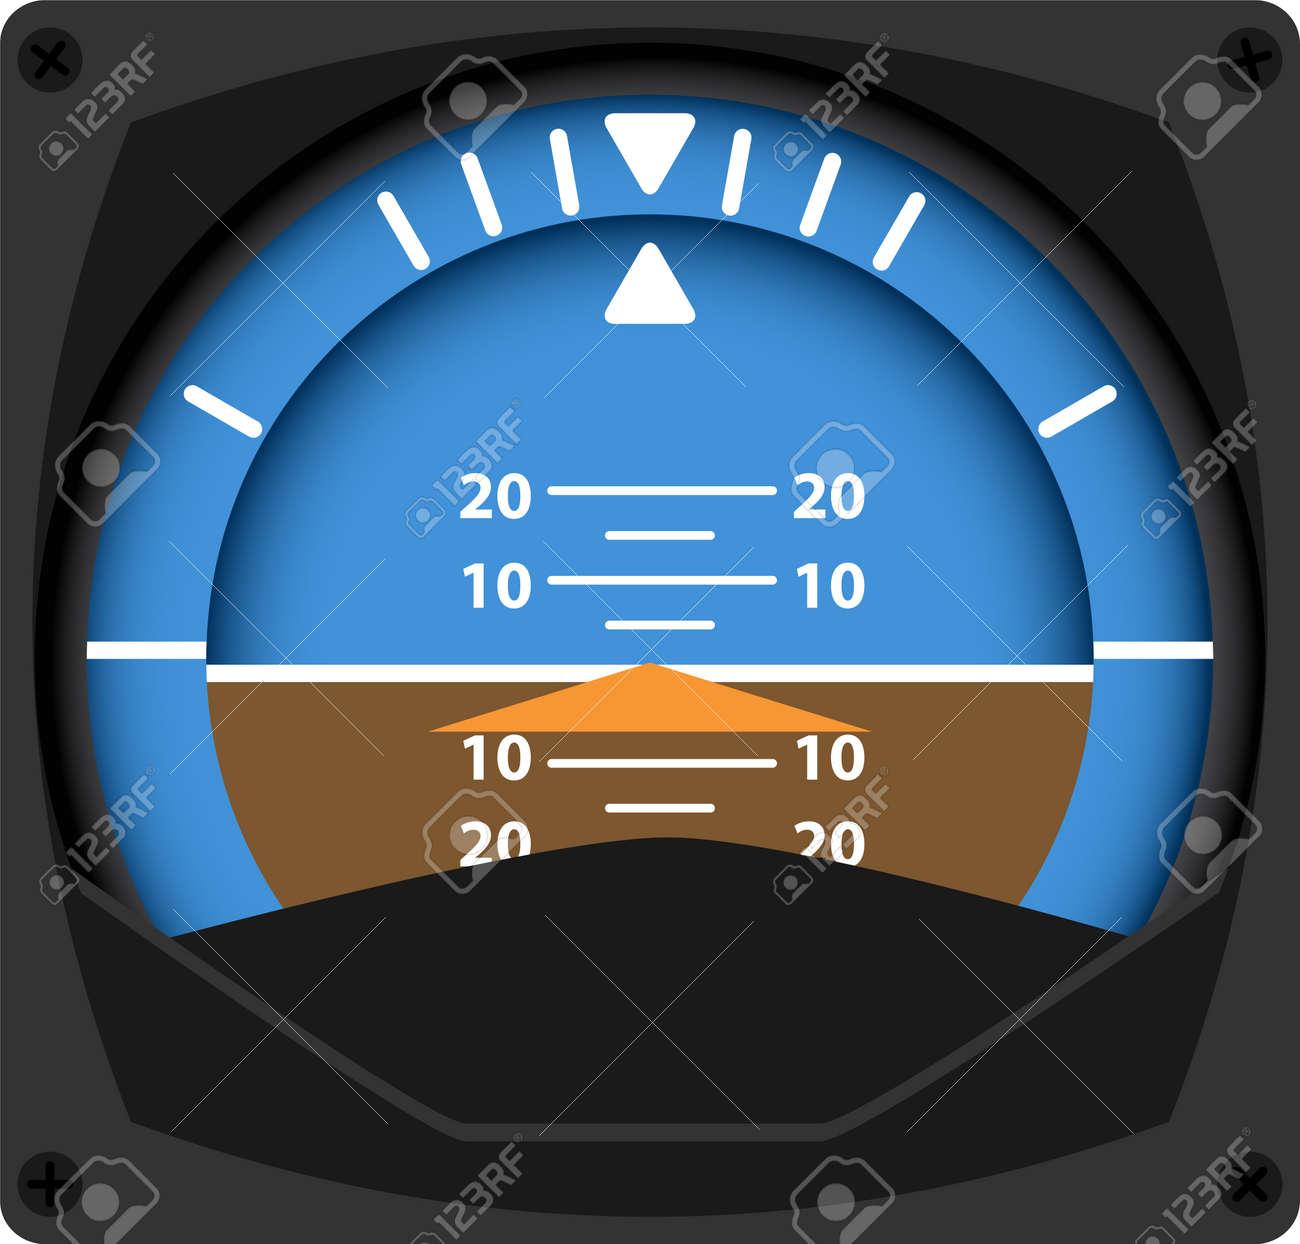 vector illustration of airplane attitude indicator - 32512823